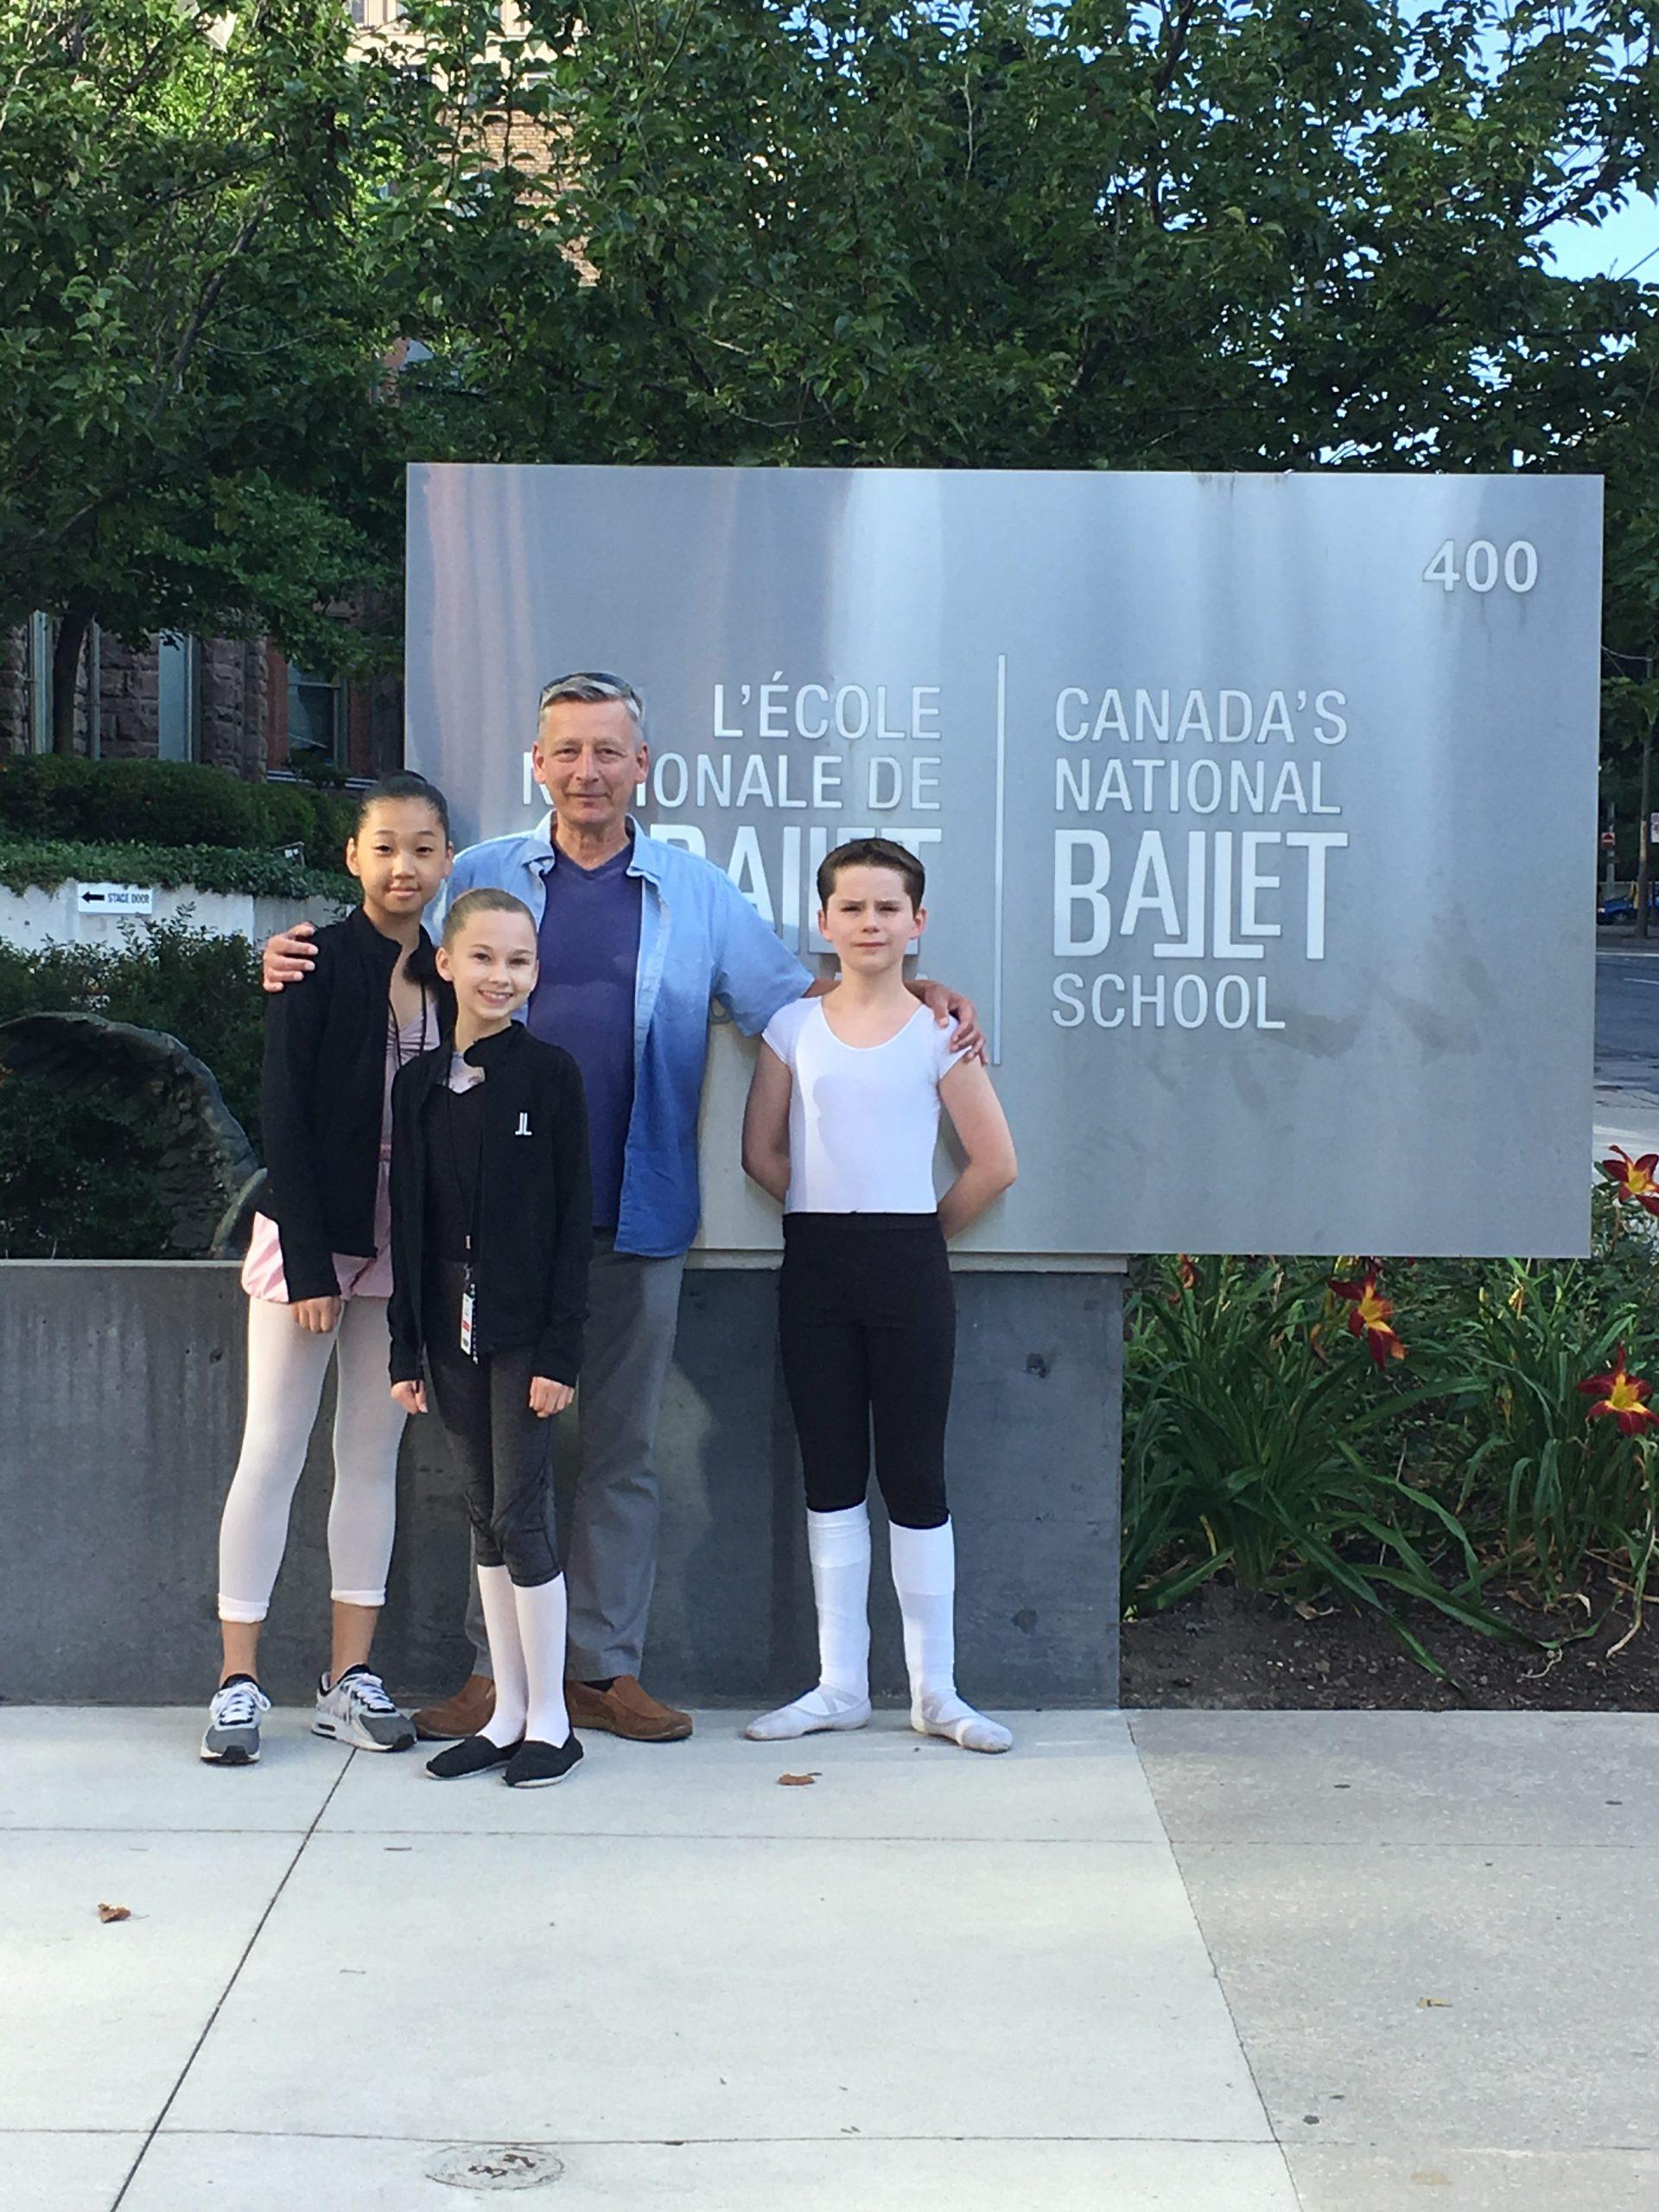 FVAD at Canada's National Ballet School